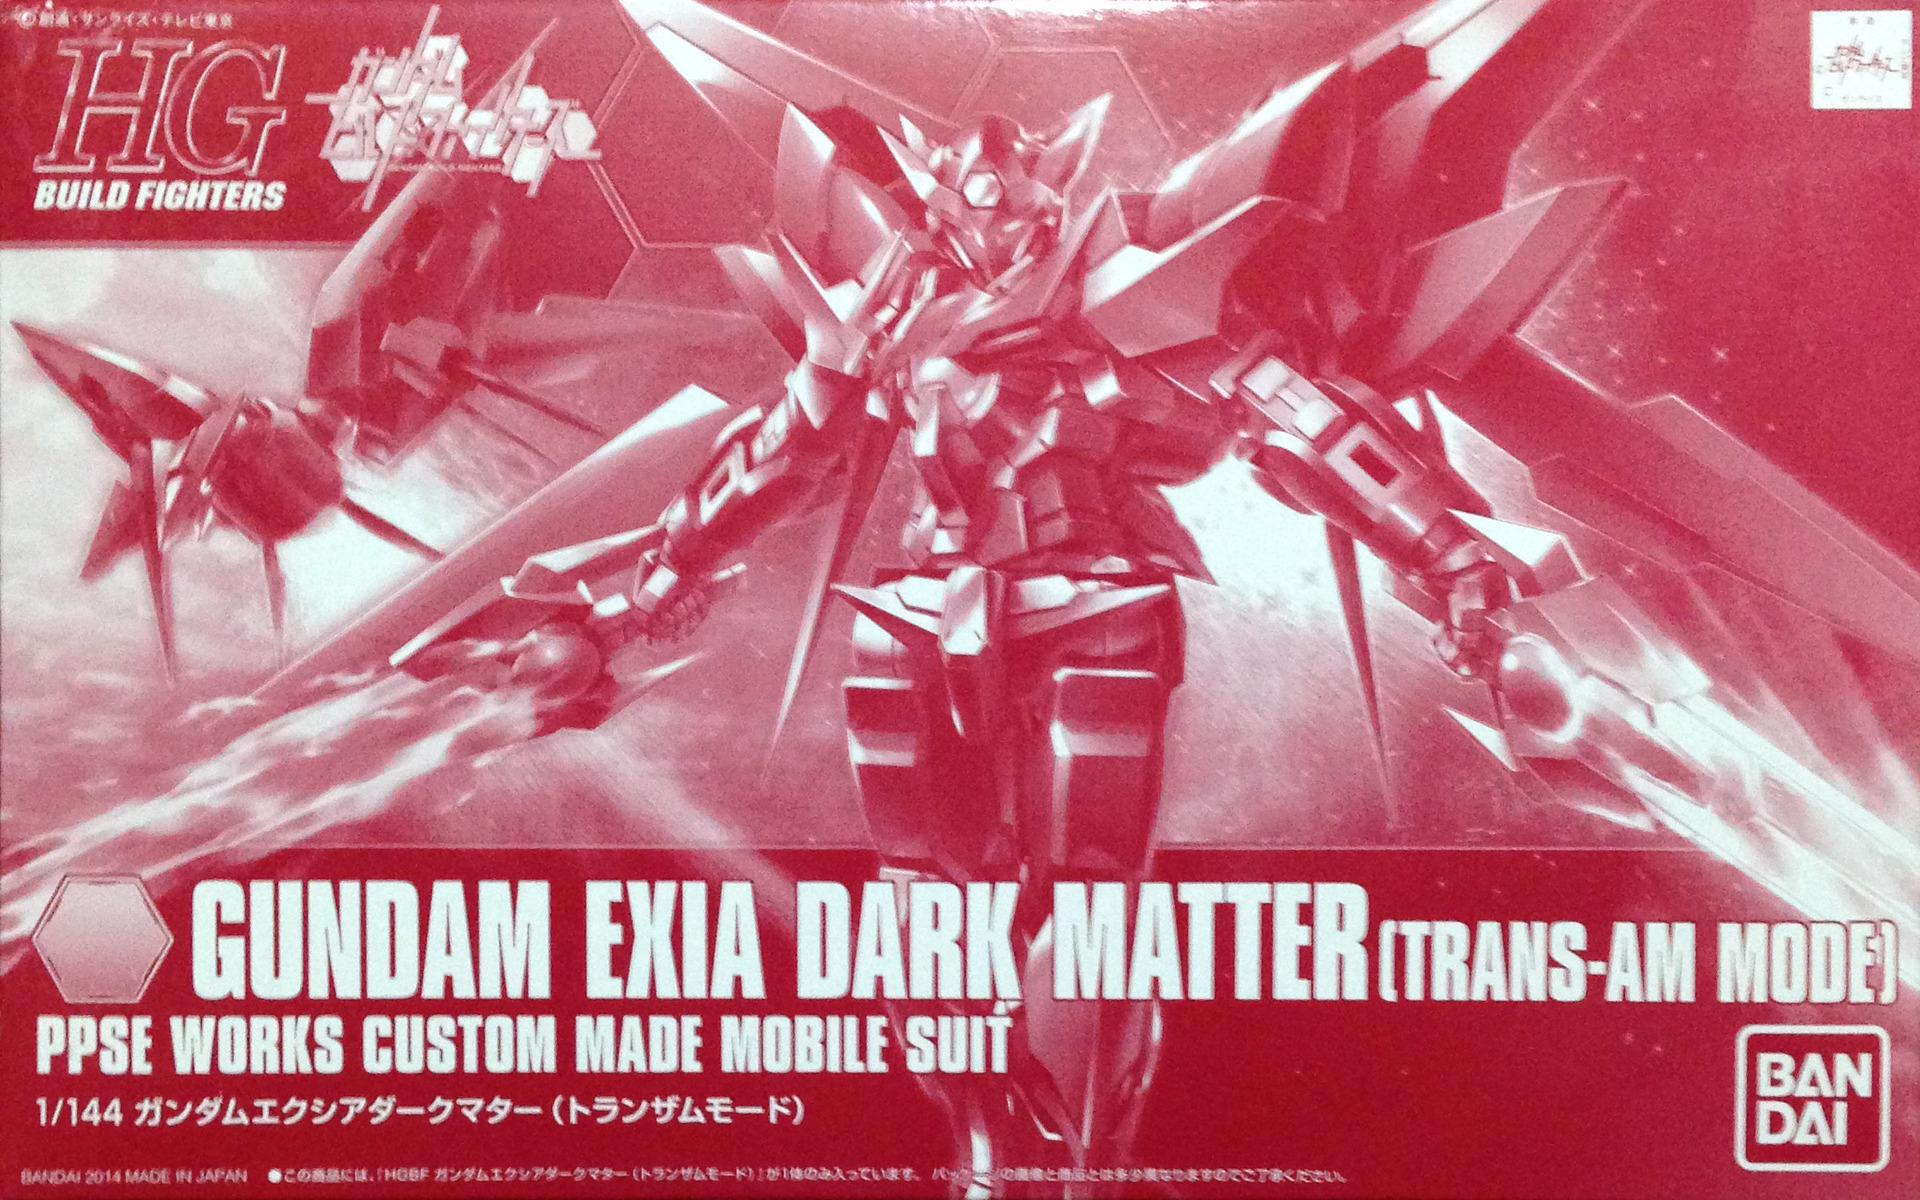 exia dark matter trans am - photo #37